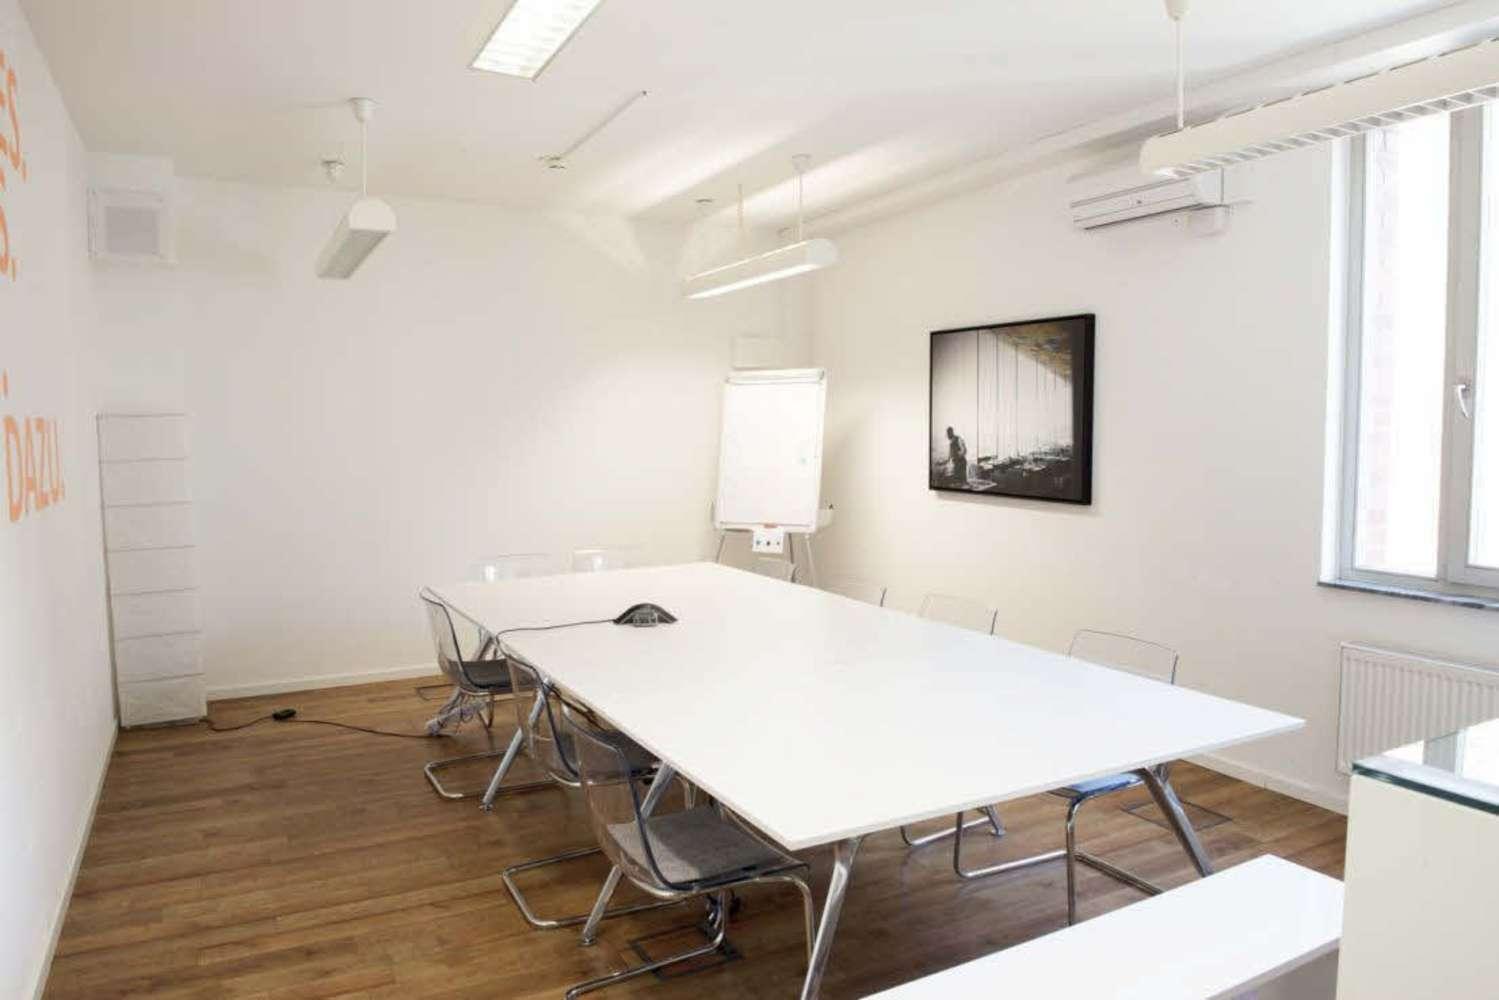 Büros Frankfurt am main, 60314 - Büro - Frankfurt am Main, Ostend - F1260 - 10545562